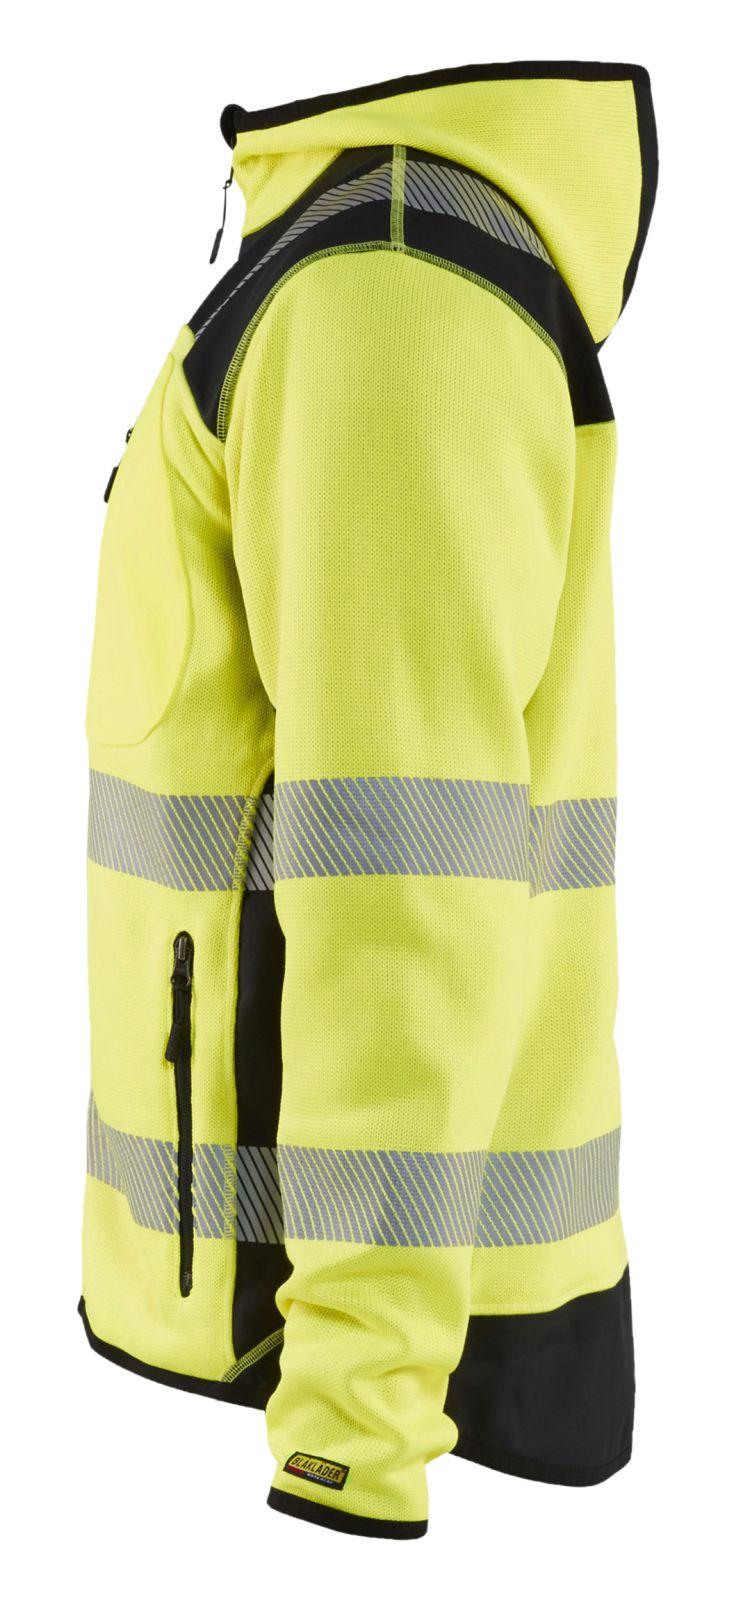 Blaklader Hooded vesten 49232120 High Vis fluo geel-zwart(3399)